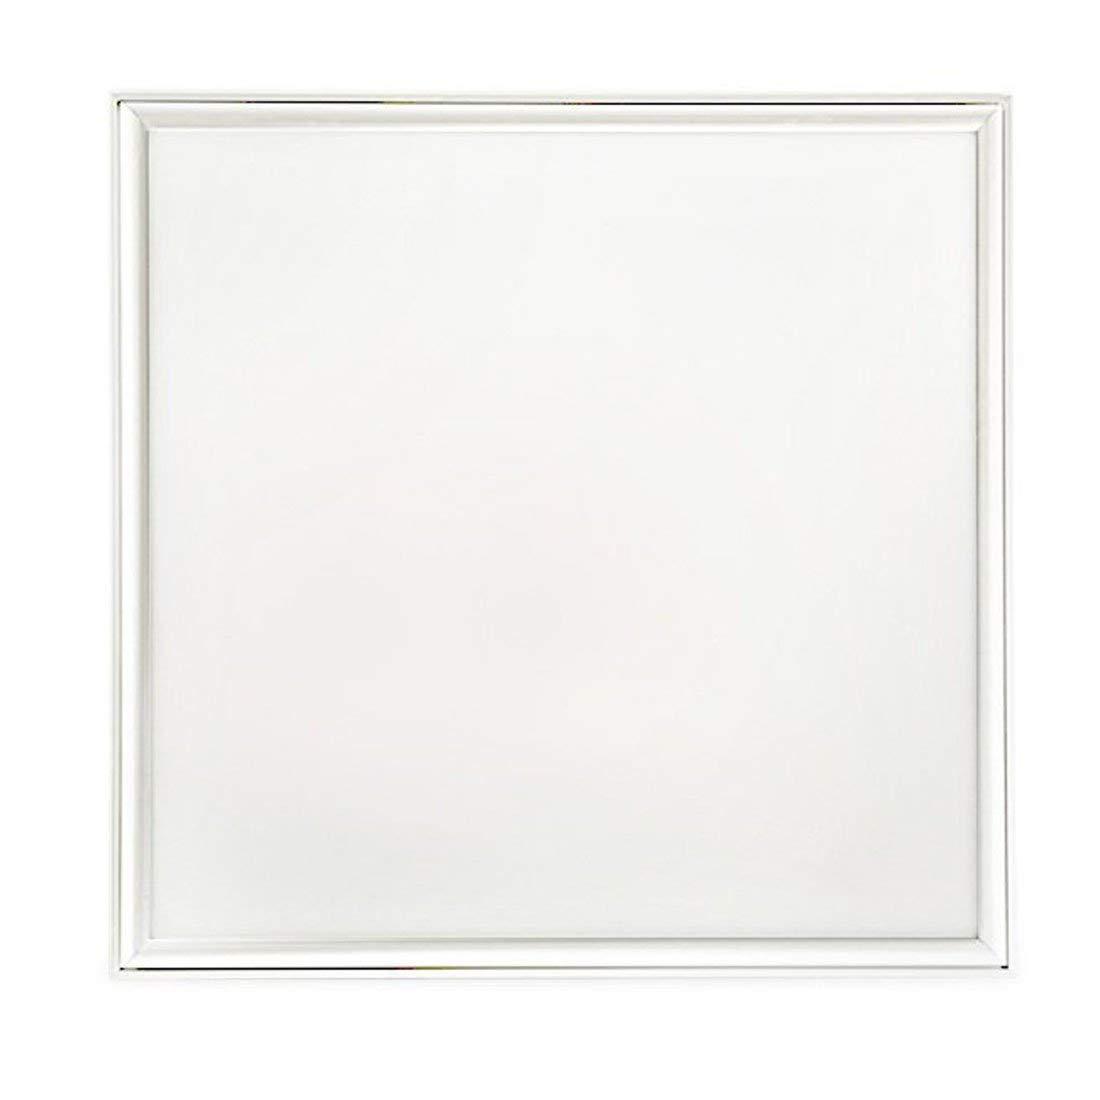 "Eotestra 2x2ft (24""x24"") LED Panel Light 40W Cool White Light (3600LM, 4000~4500K) with Aluminum Frame for Office/ Kitchen/ Hotel/ Supermarket Ceiling Flat Tile Panel Light include Led Driver …"